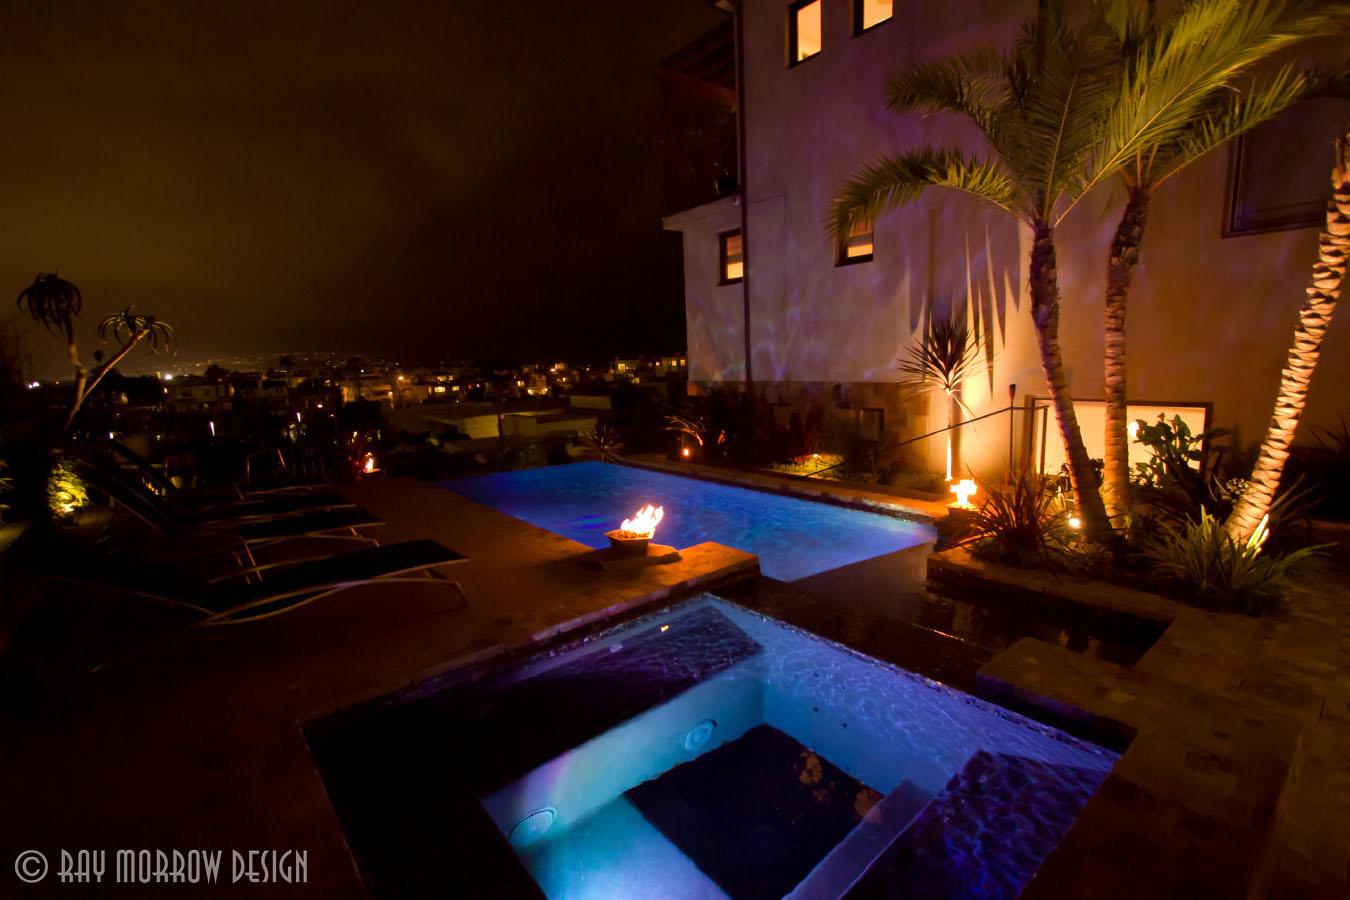 pool-spa-night-manhattan-beach.jpg